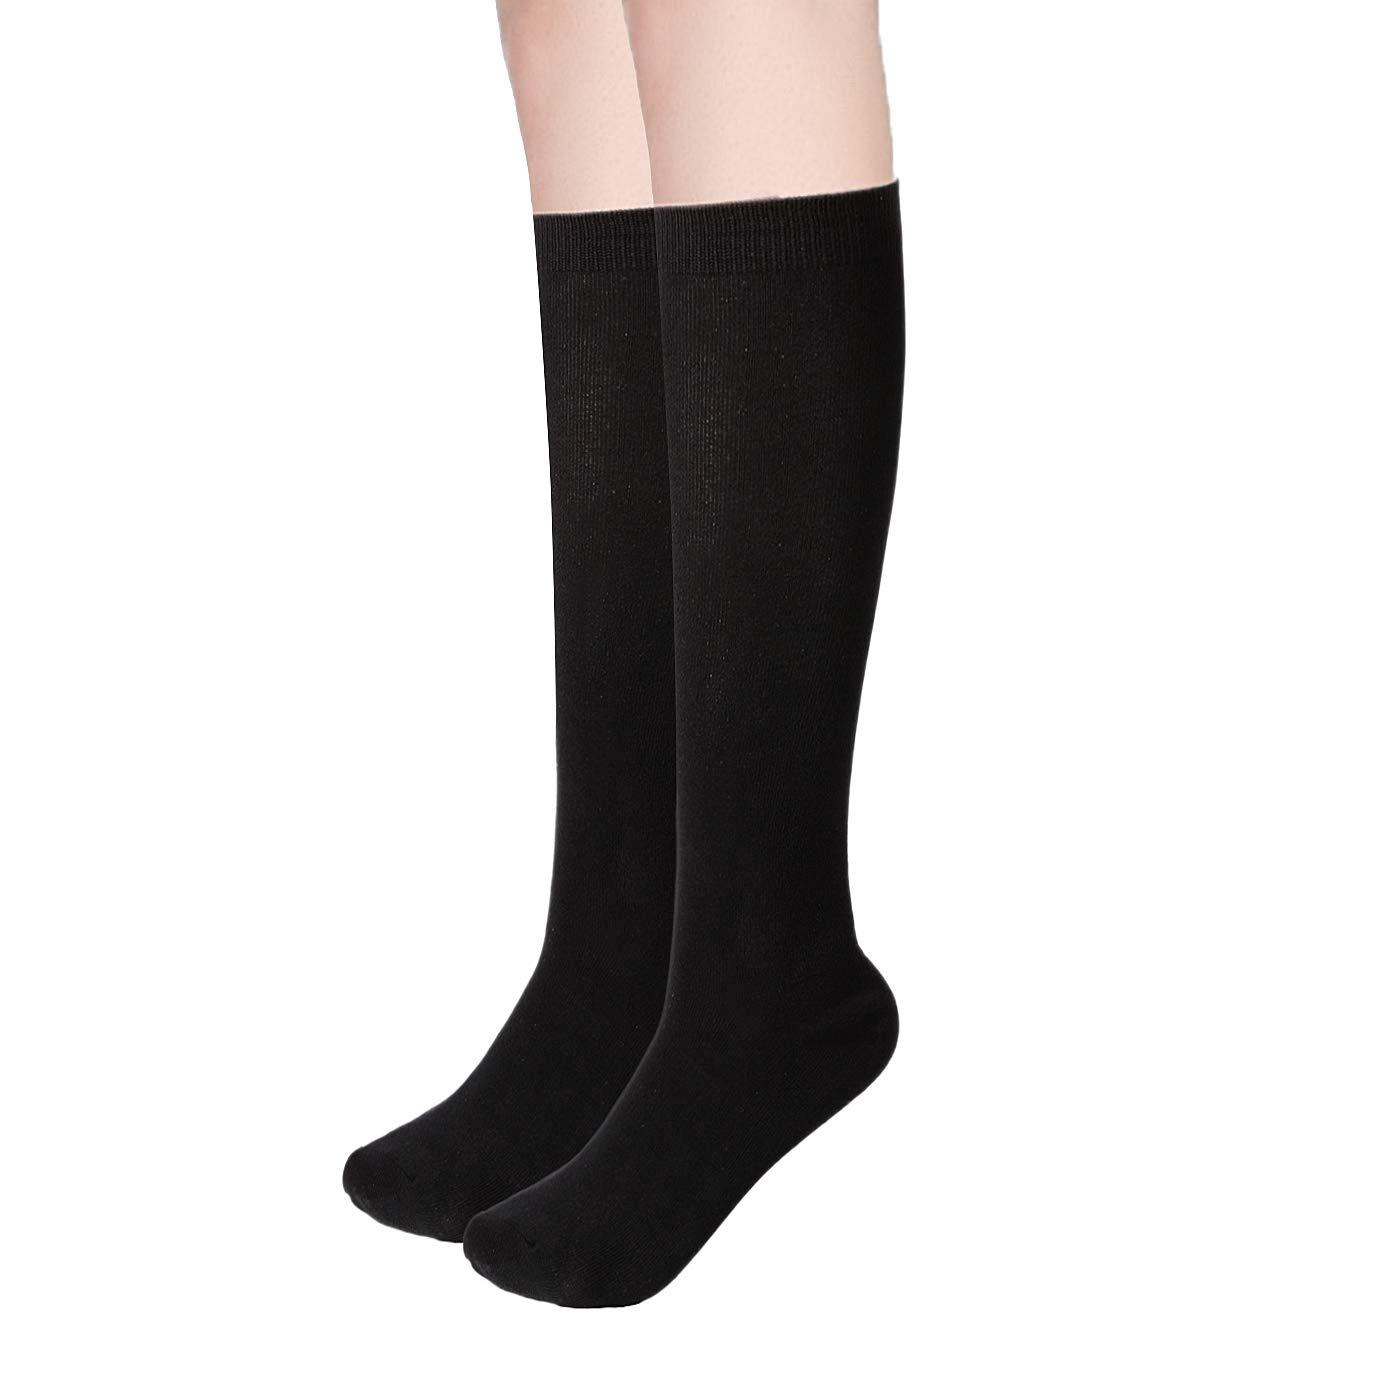 Women's Bamboo Casual Knee High Socks Seamless Toe Breathable Student/Teacher/Travel/Athletic Medium